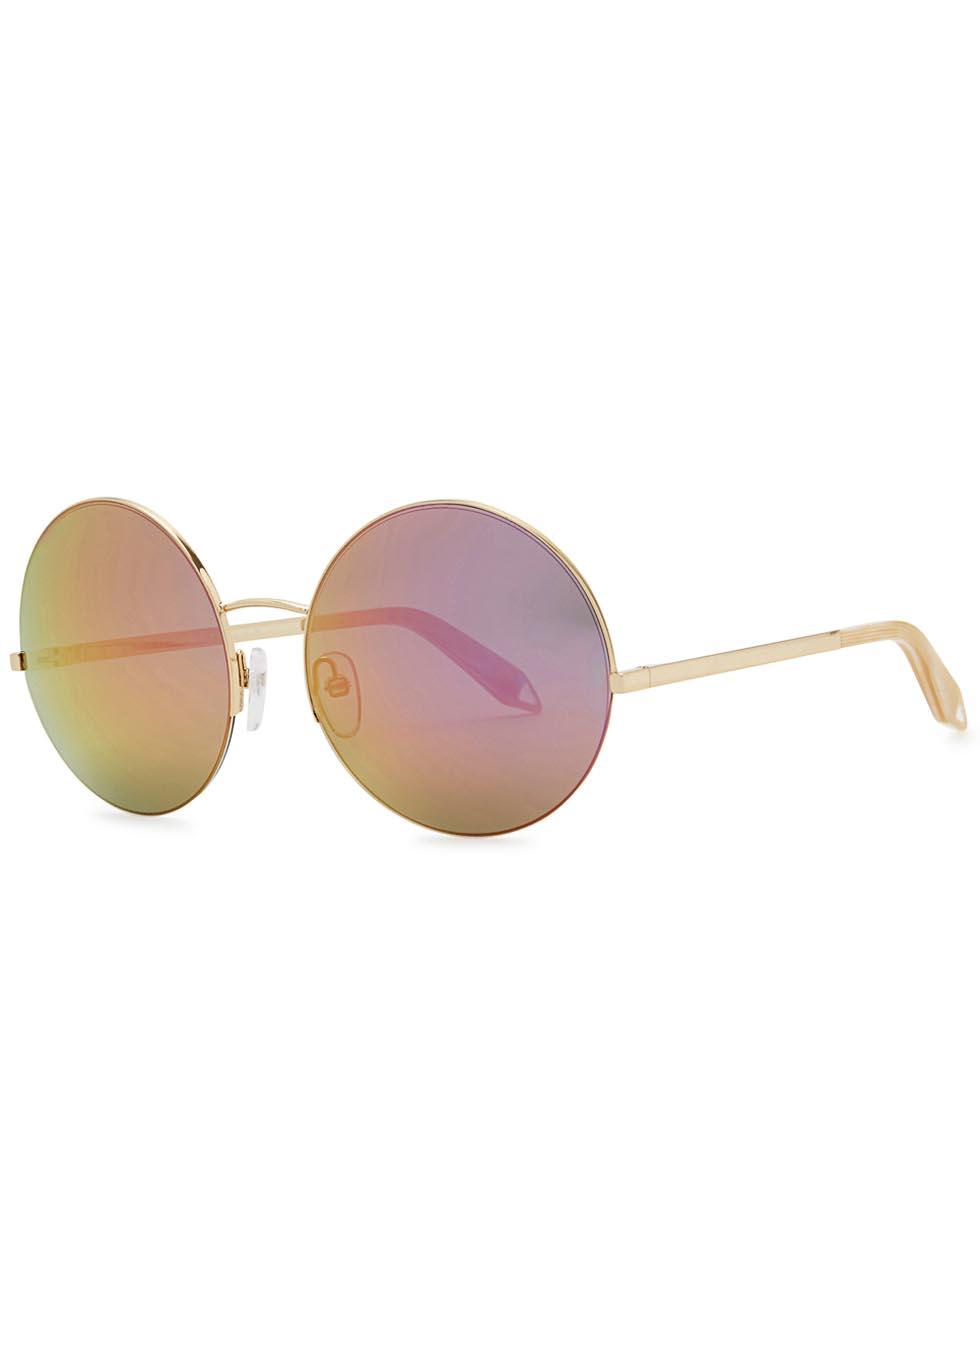 Supra Round mirrored gold tone sunglasses - Victoria Beckham